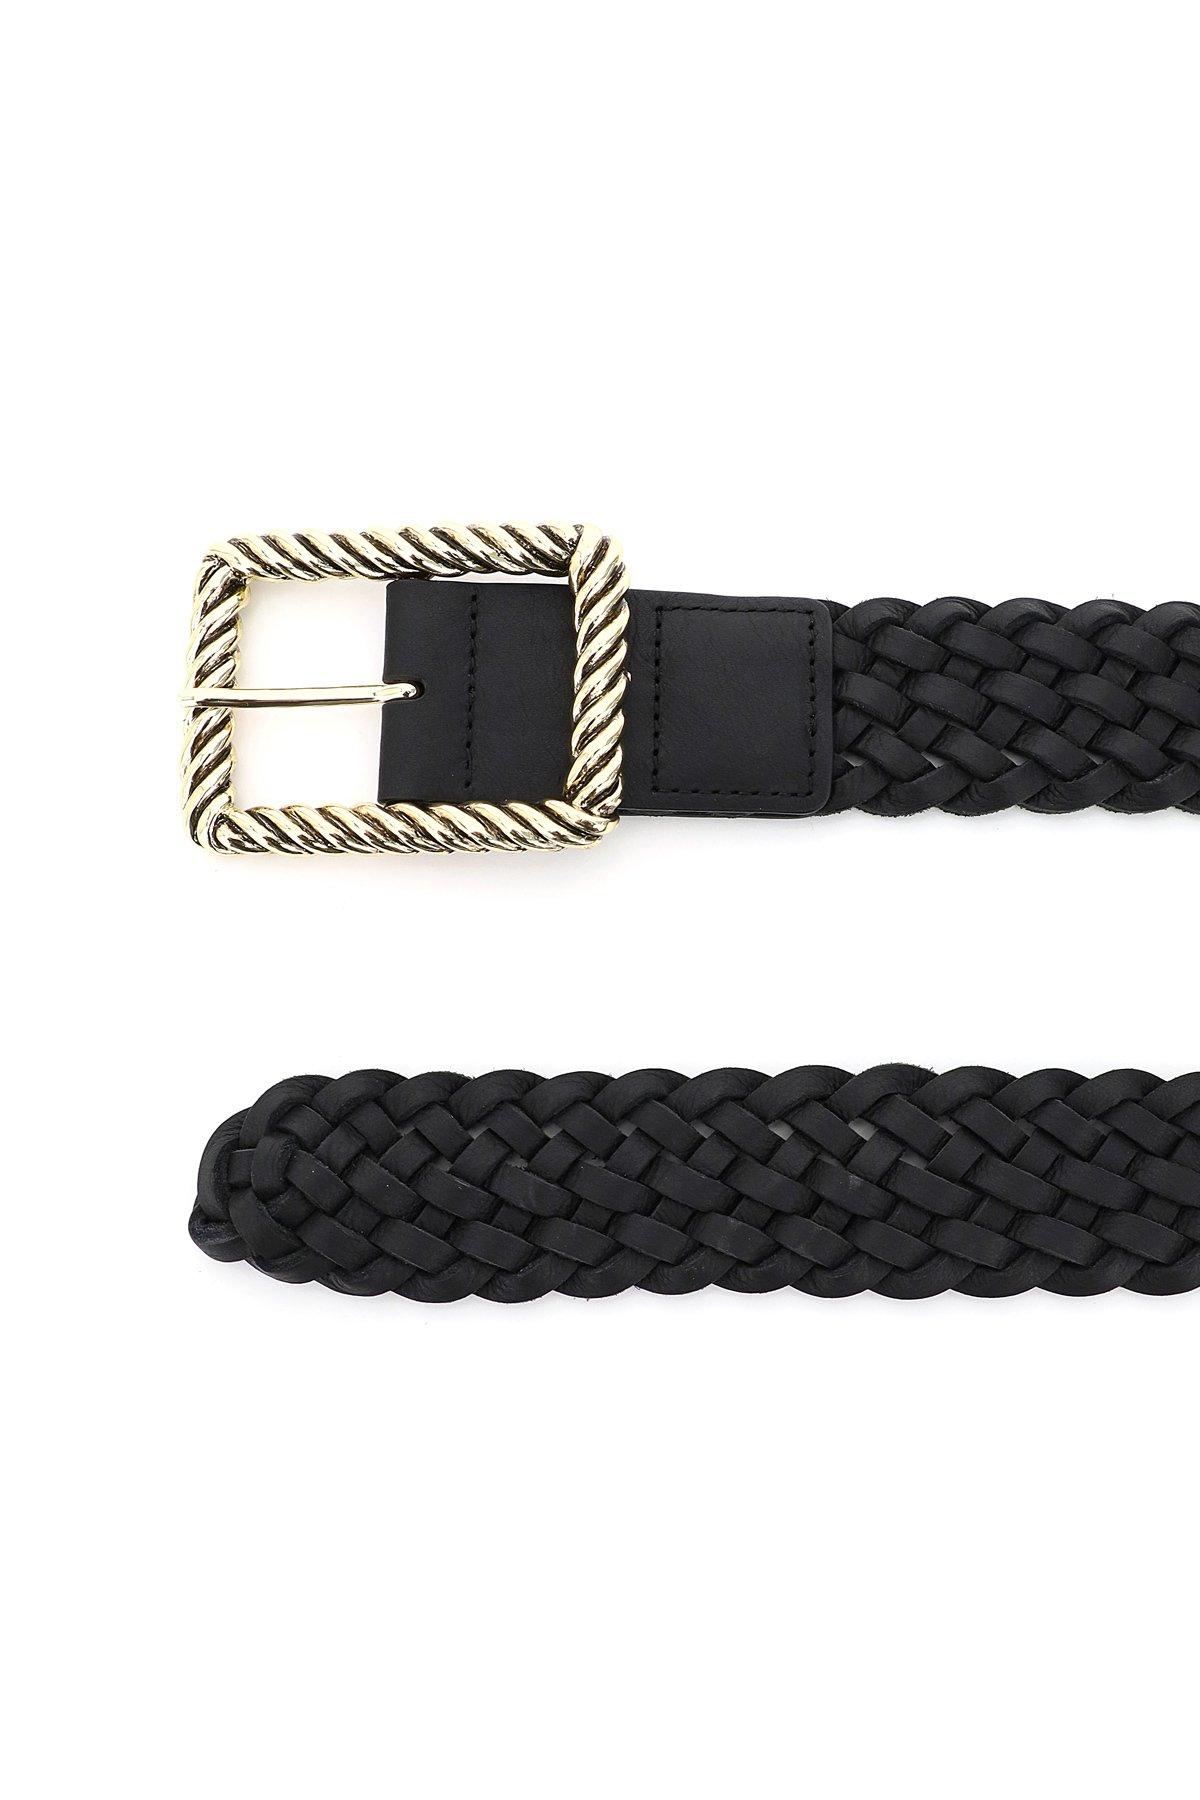 B low the belt cintura in pelle intrecciata jeanelle